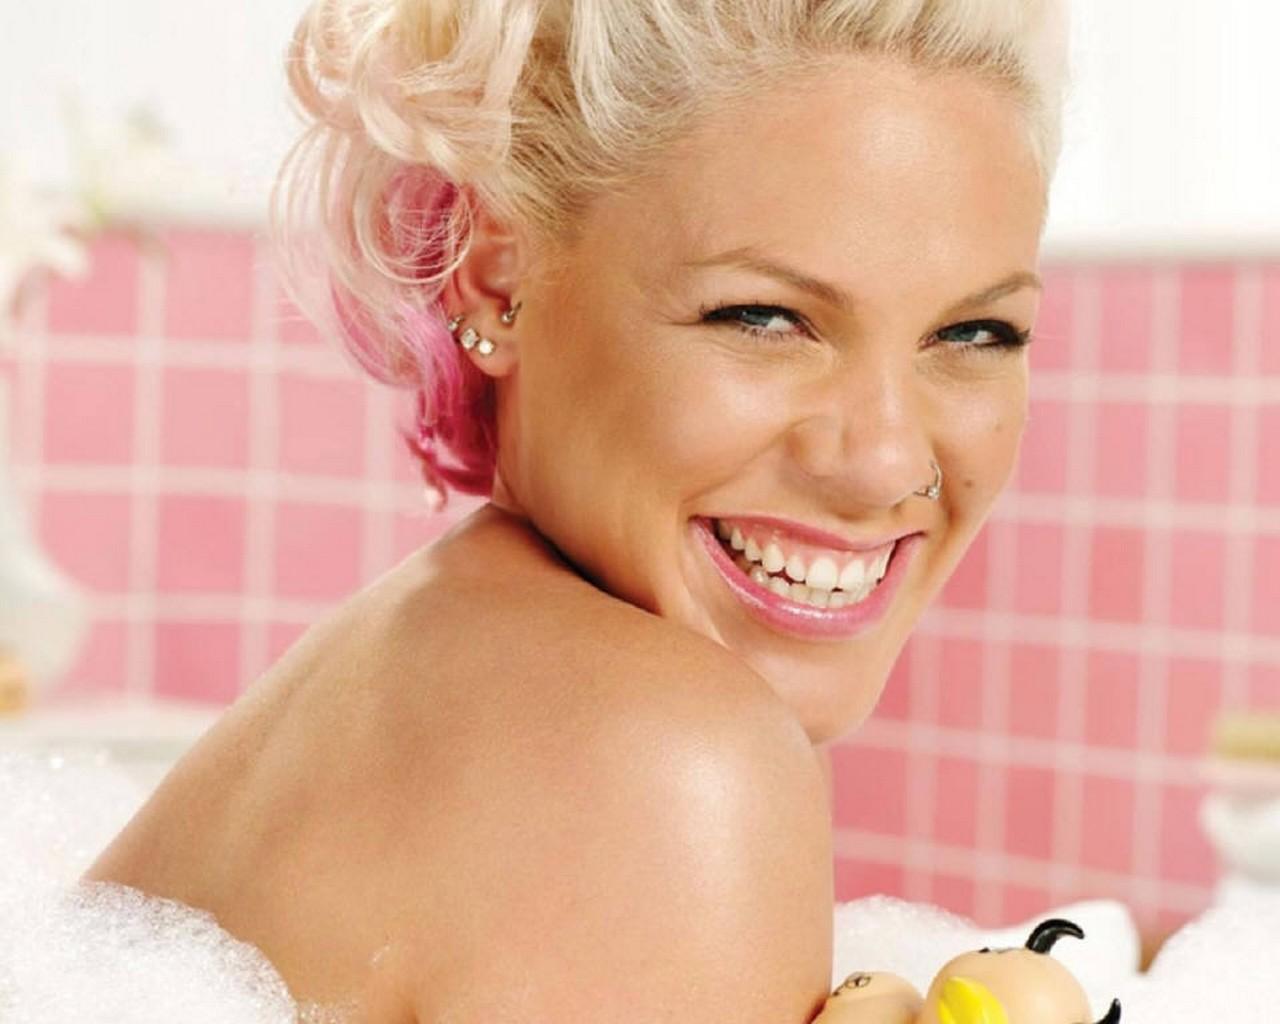 Pink Addresses US 'Popularity Contest' - That Grape Juice